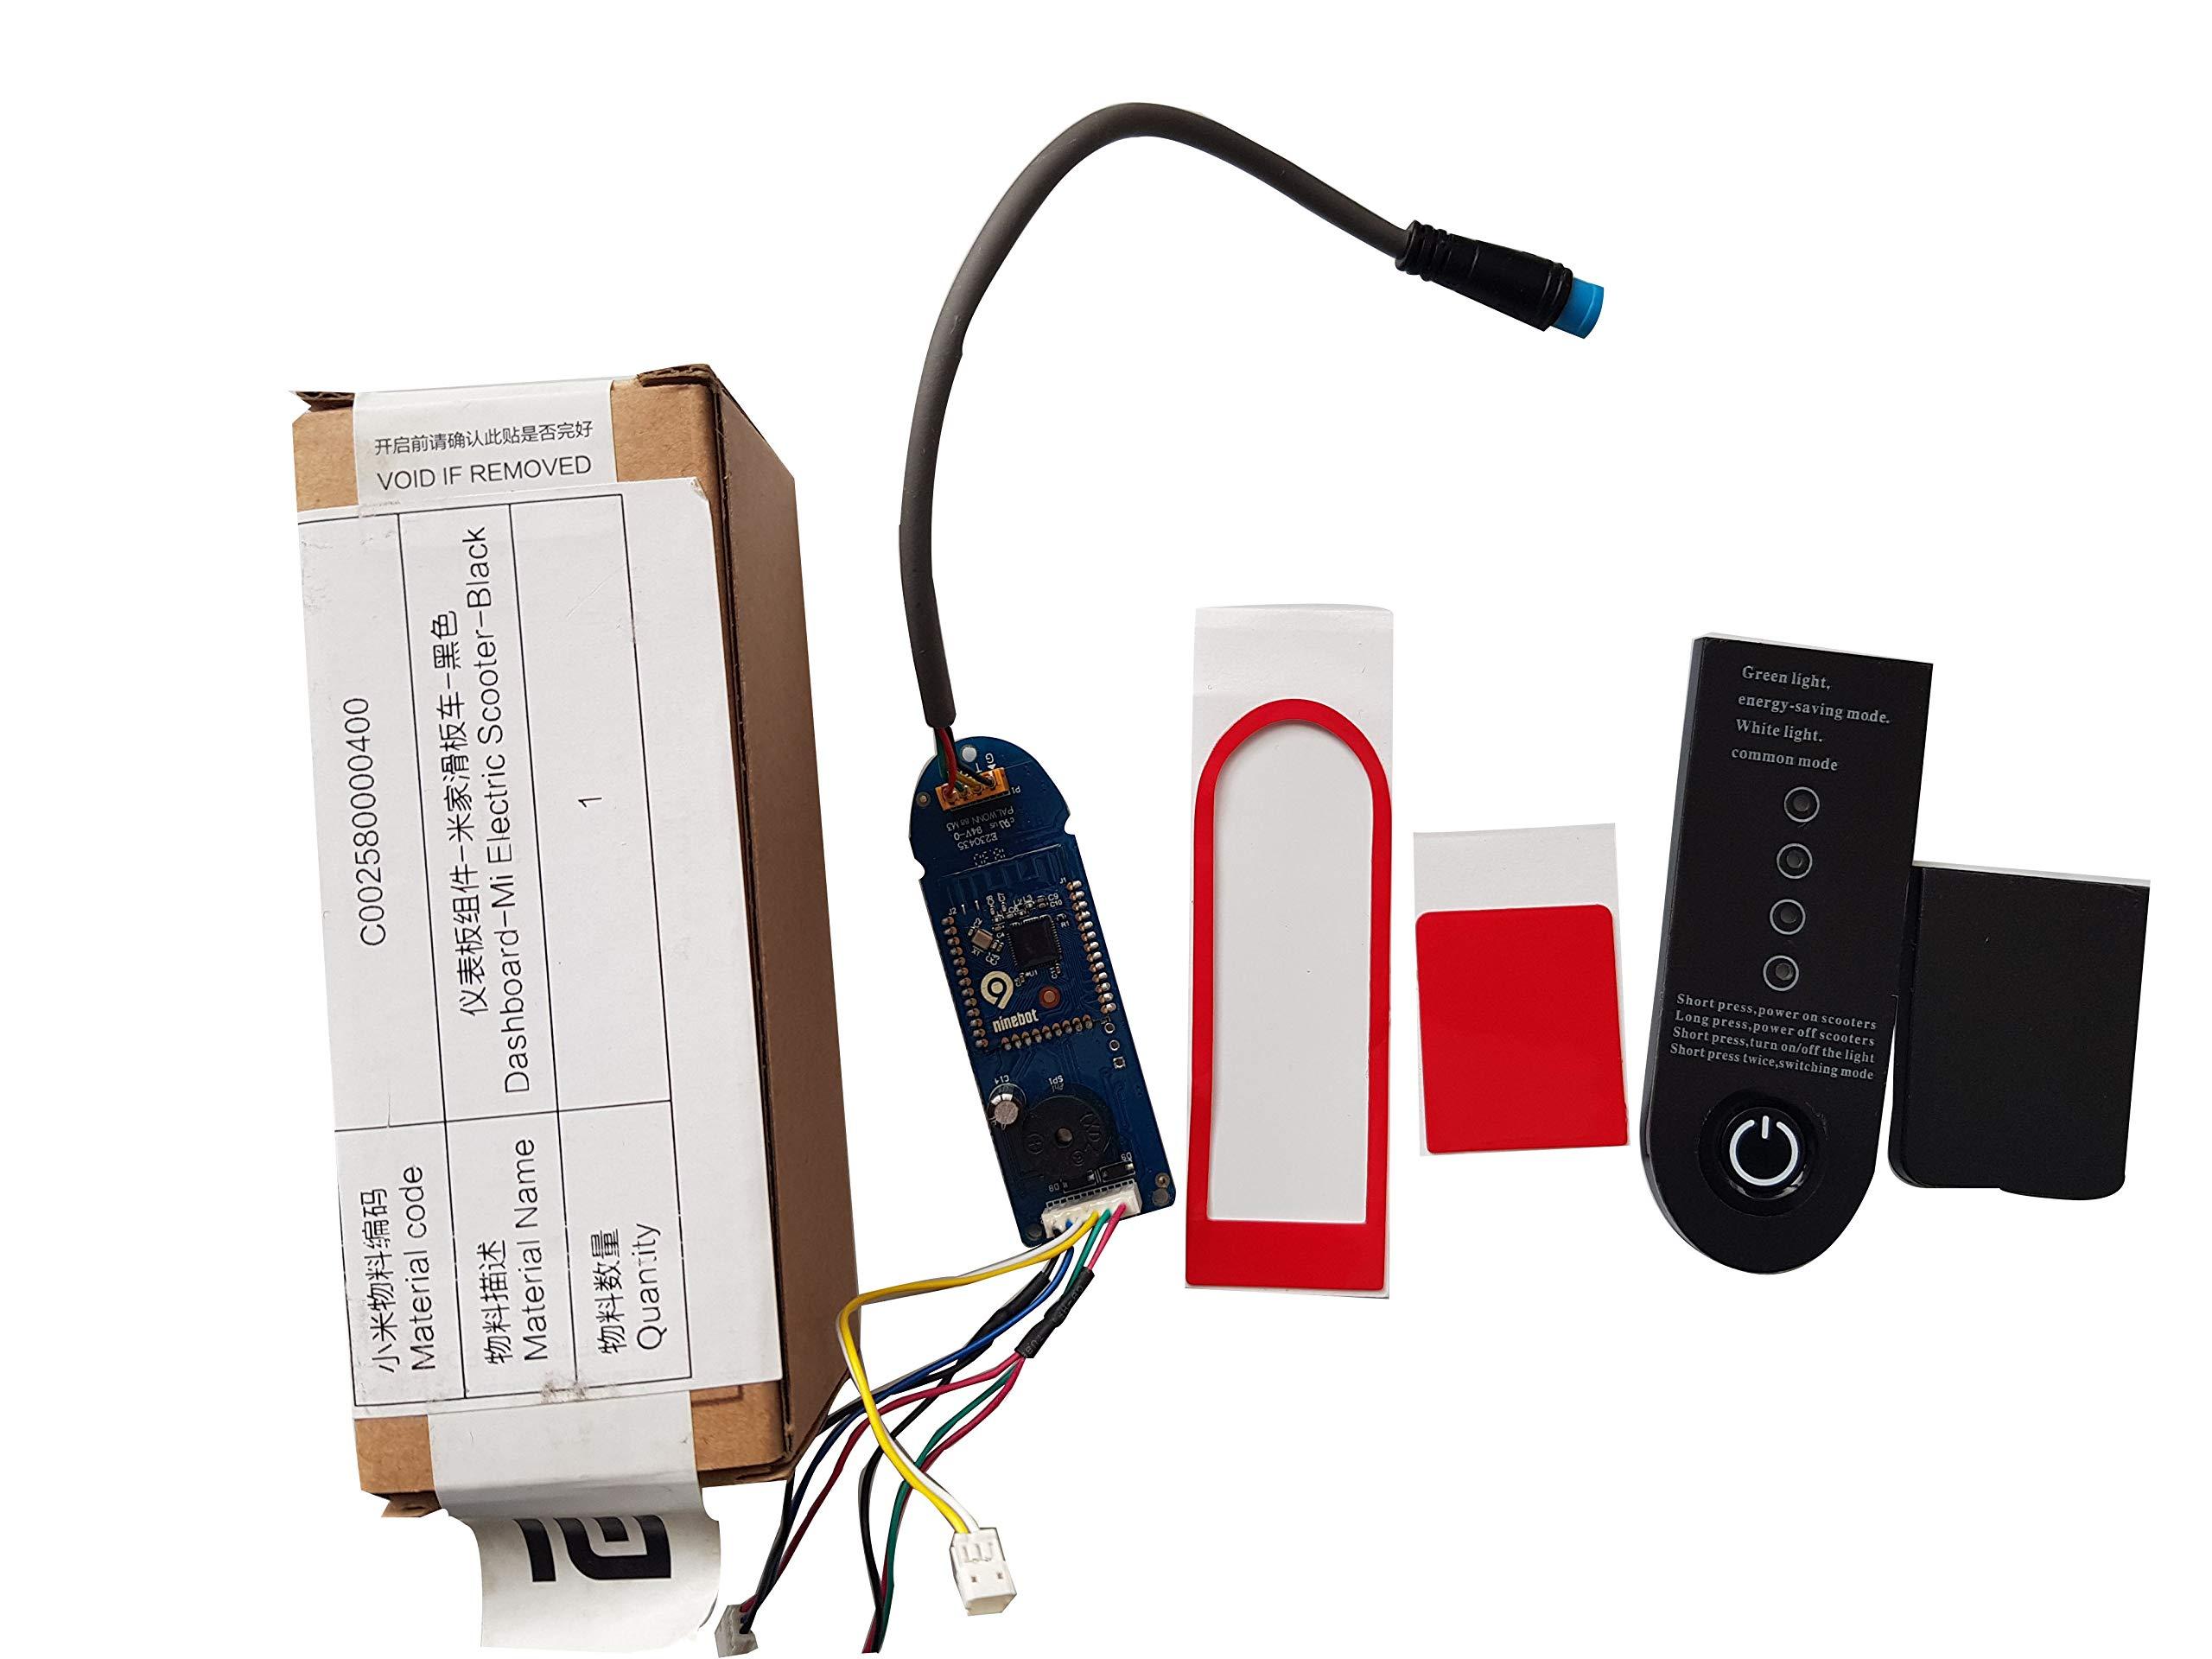 SPEDWHEL Original Dashboard for XIAOMI MIJIA M365 Electric Scooter Instrument Circuit Board (Original Dashboard with Cover&Stickers) by SPEDWHEL